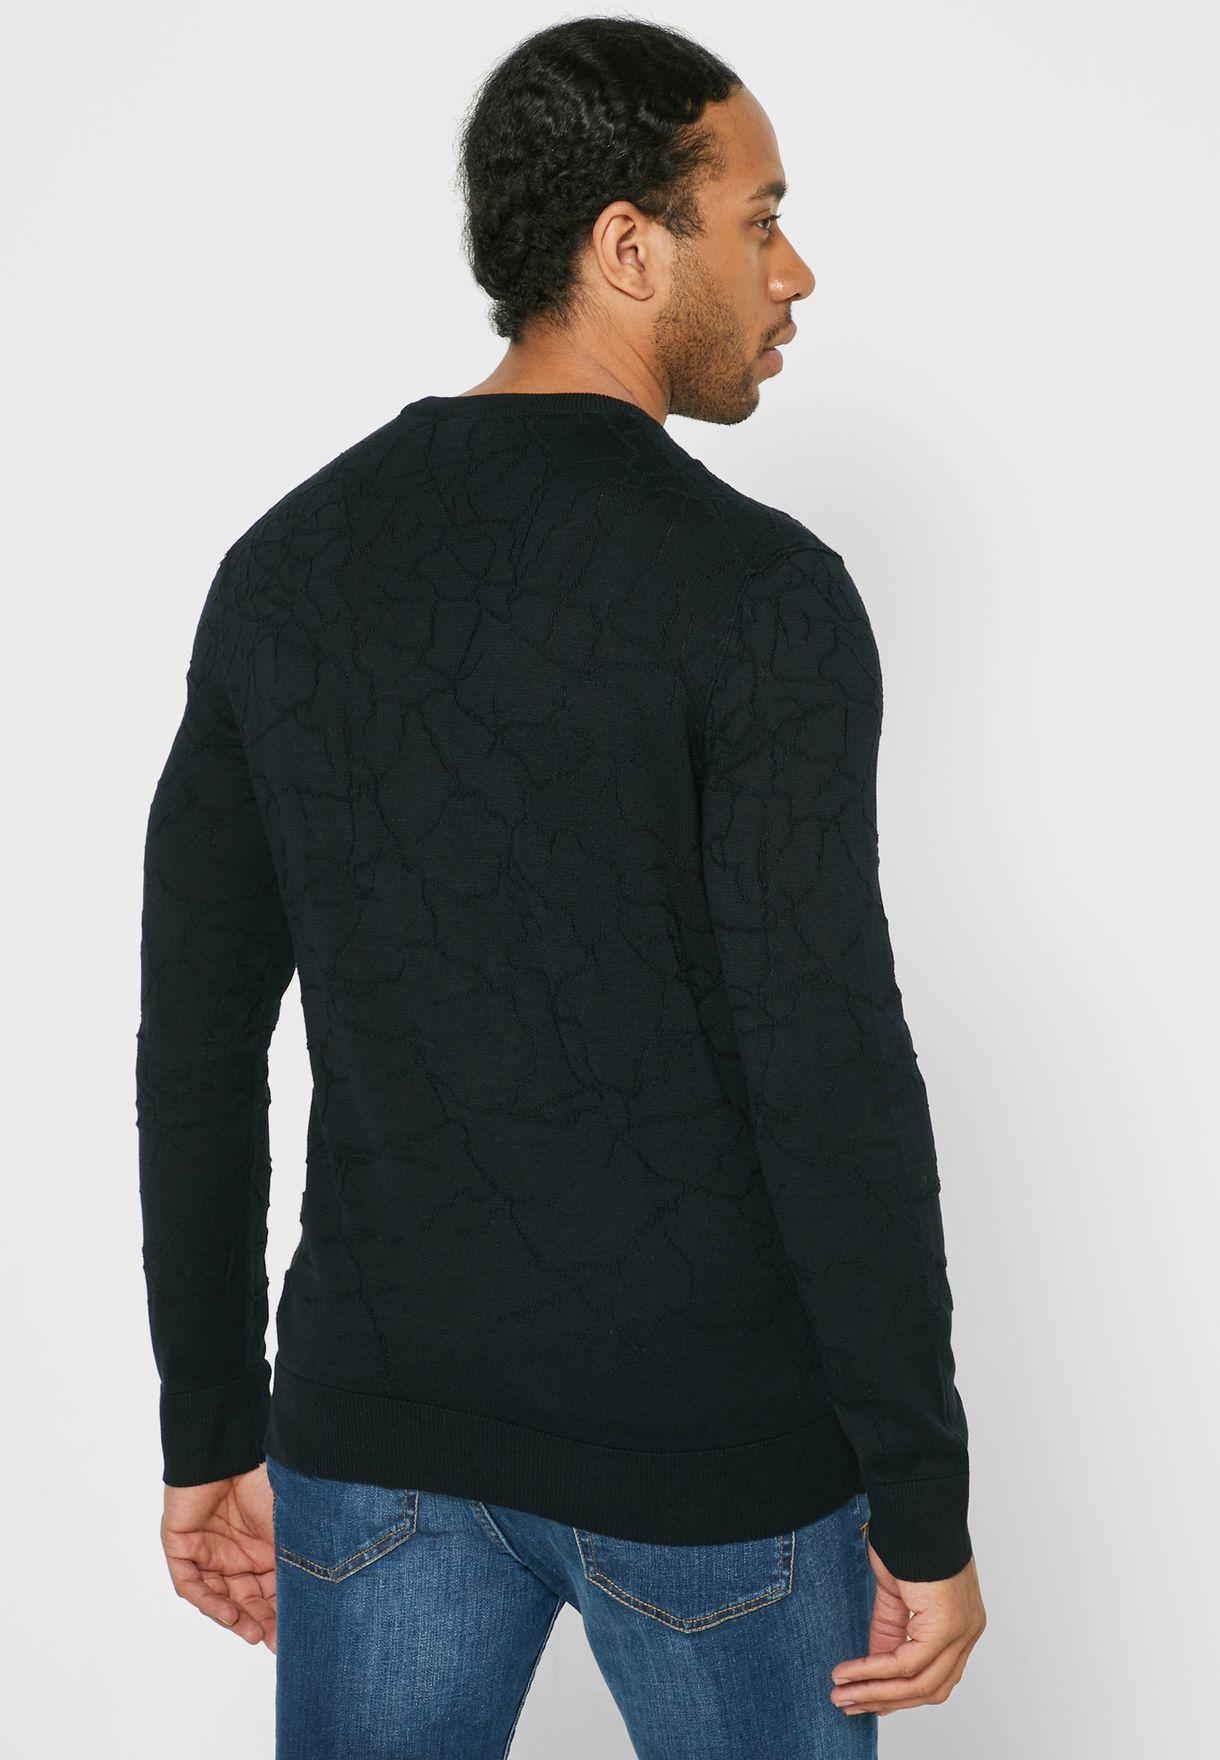 Bristol Sweater